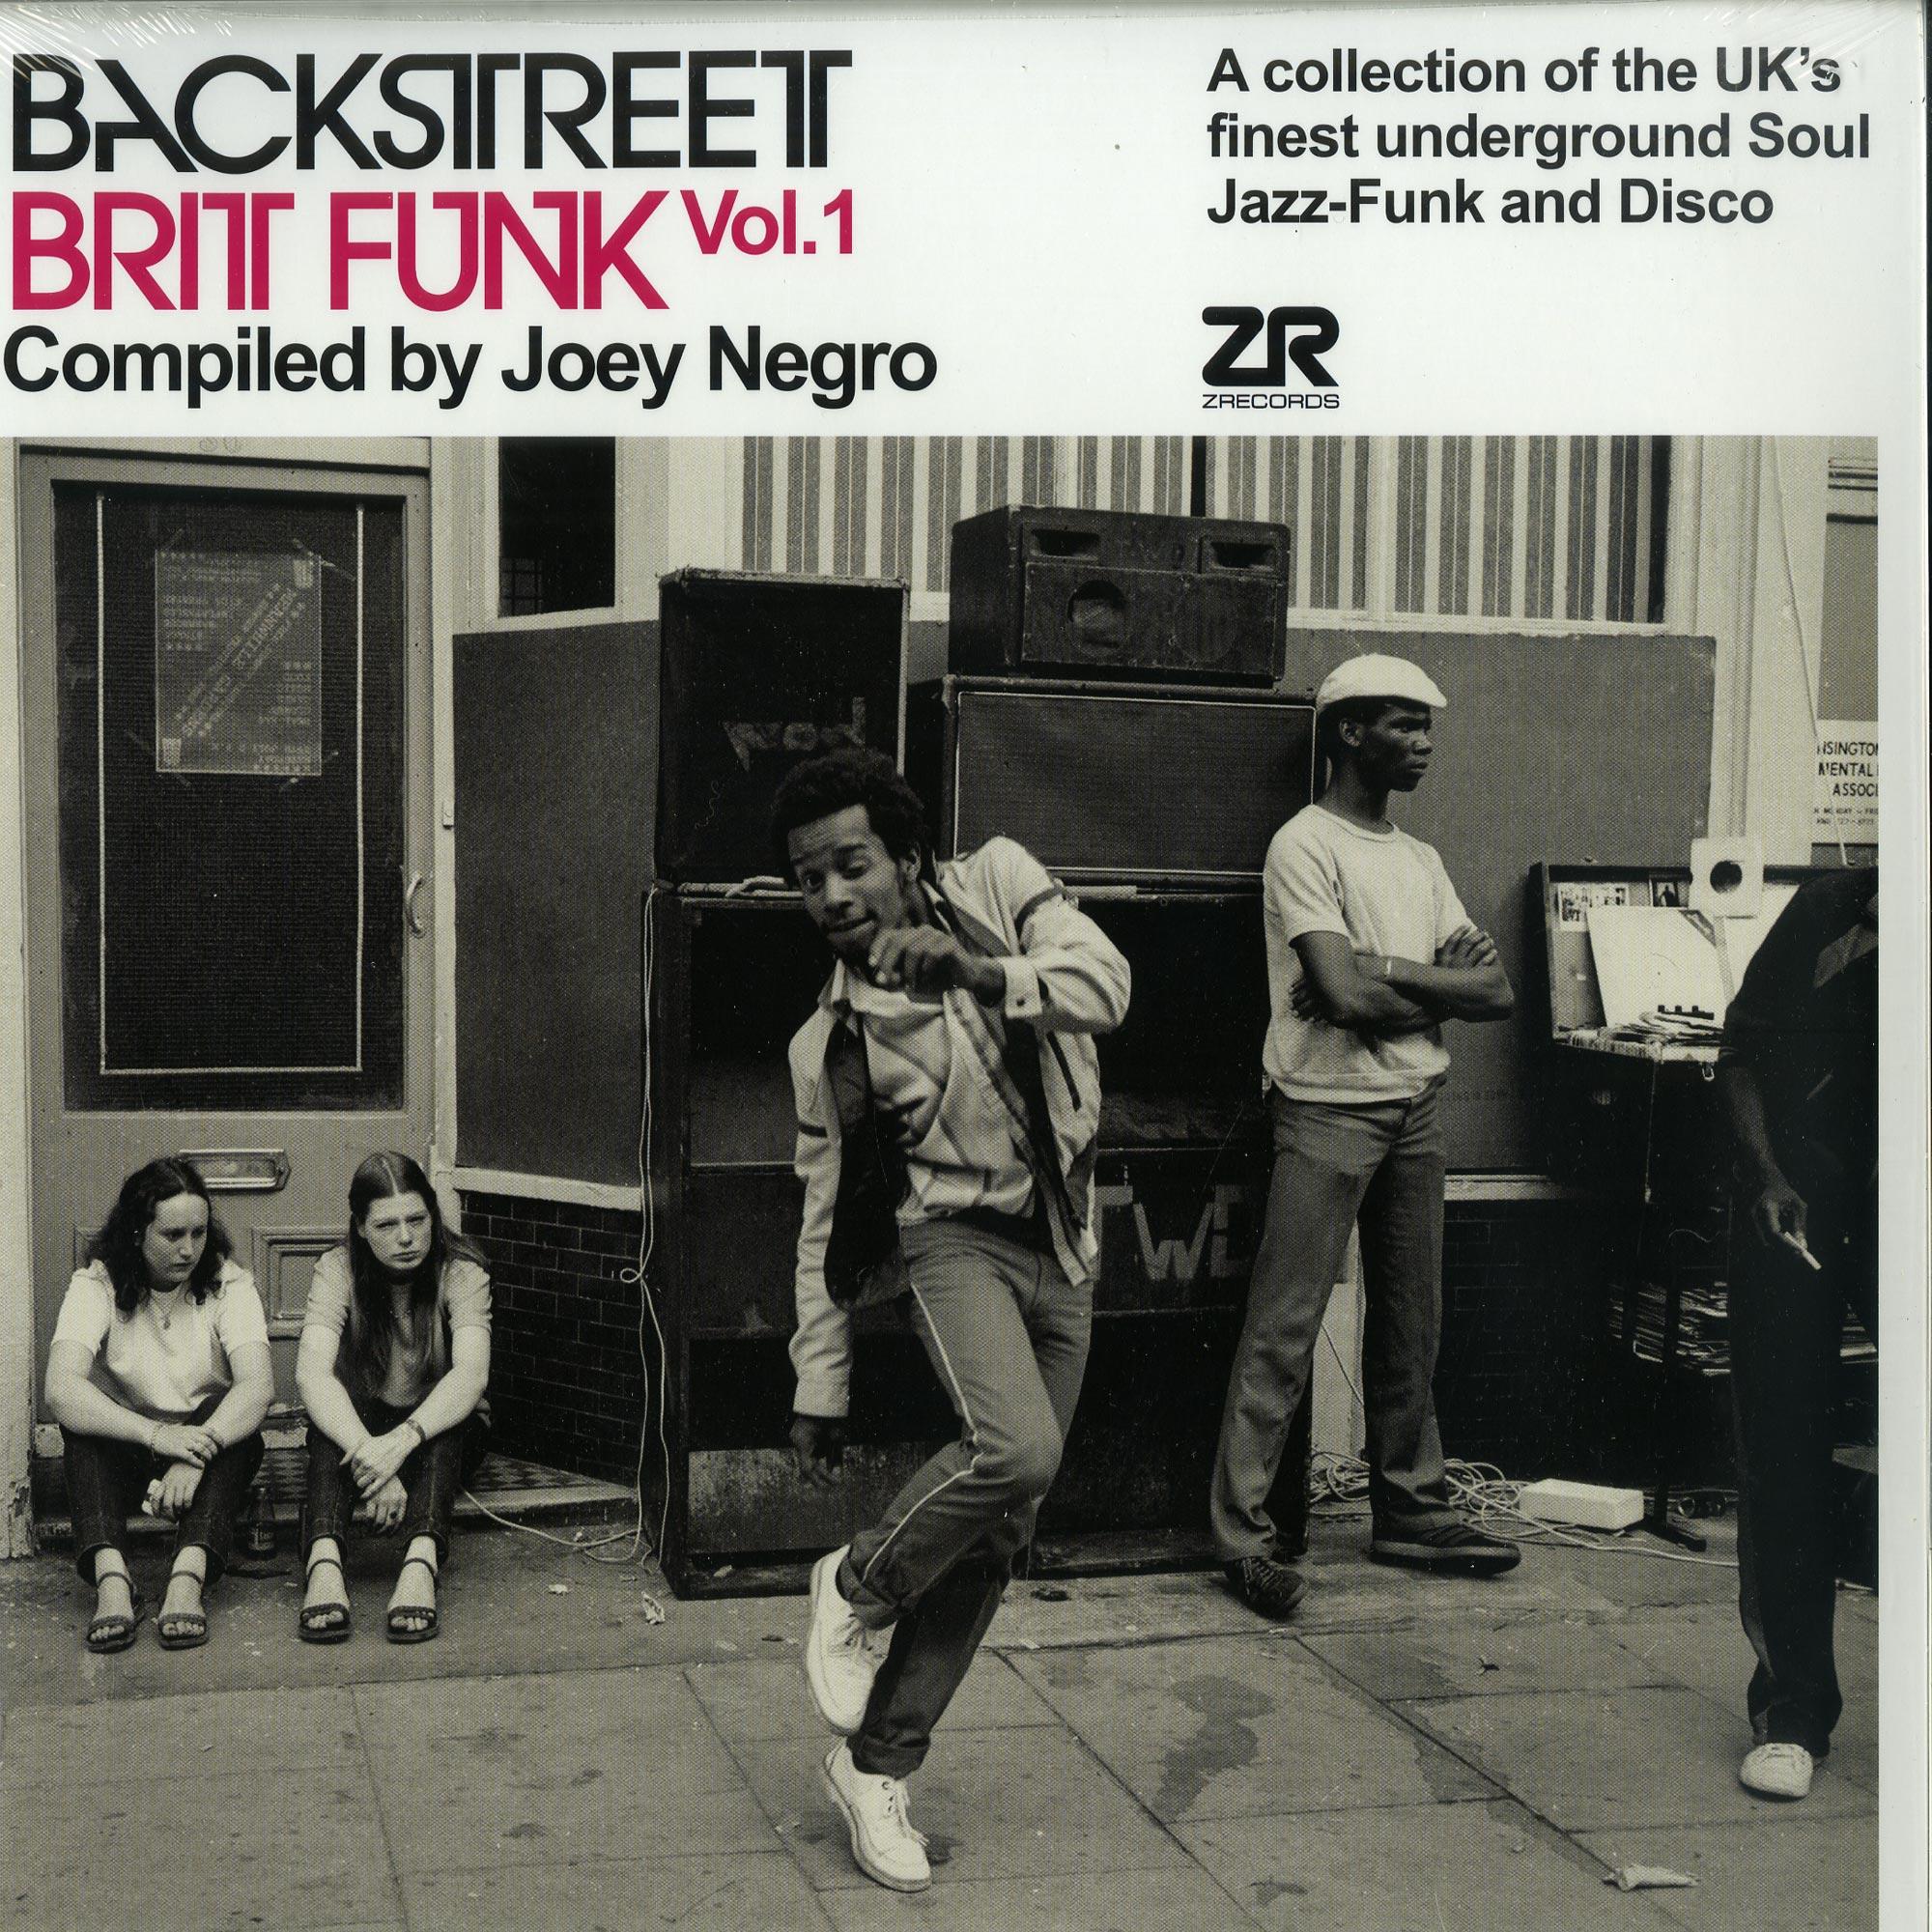 Various / Compiled by Joey Negro - BACKSTREET BRIT FUNK 1